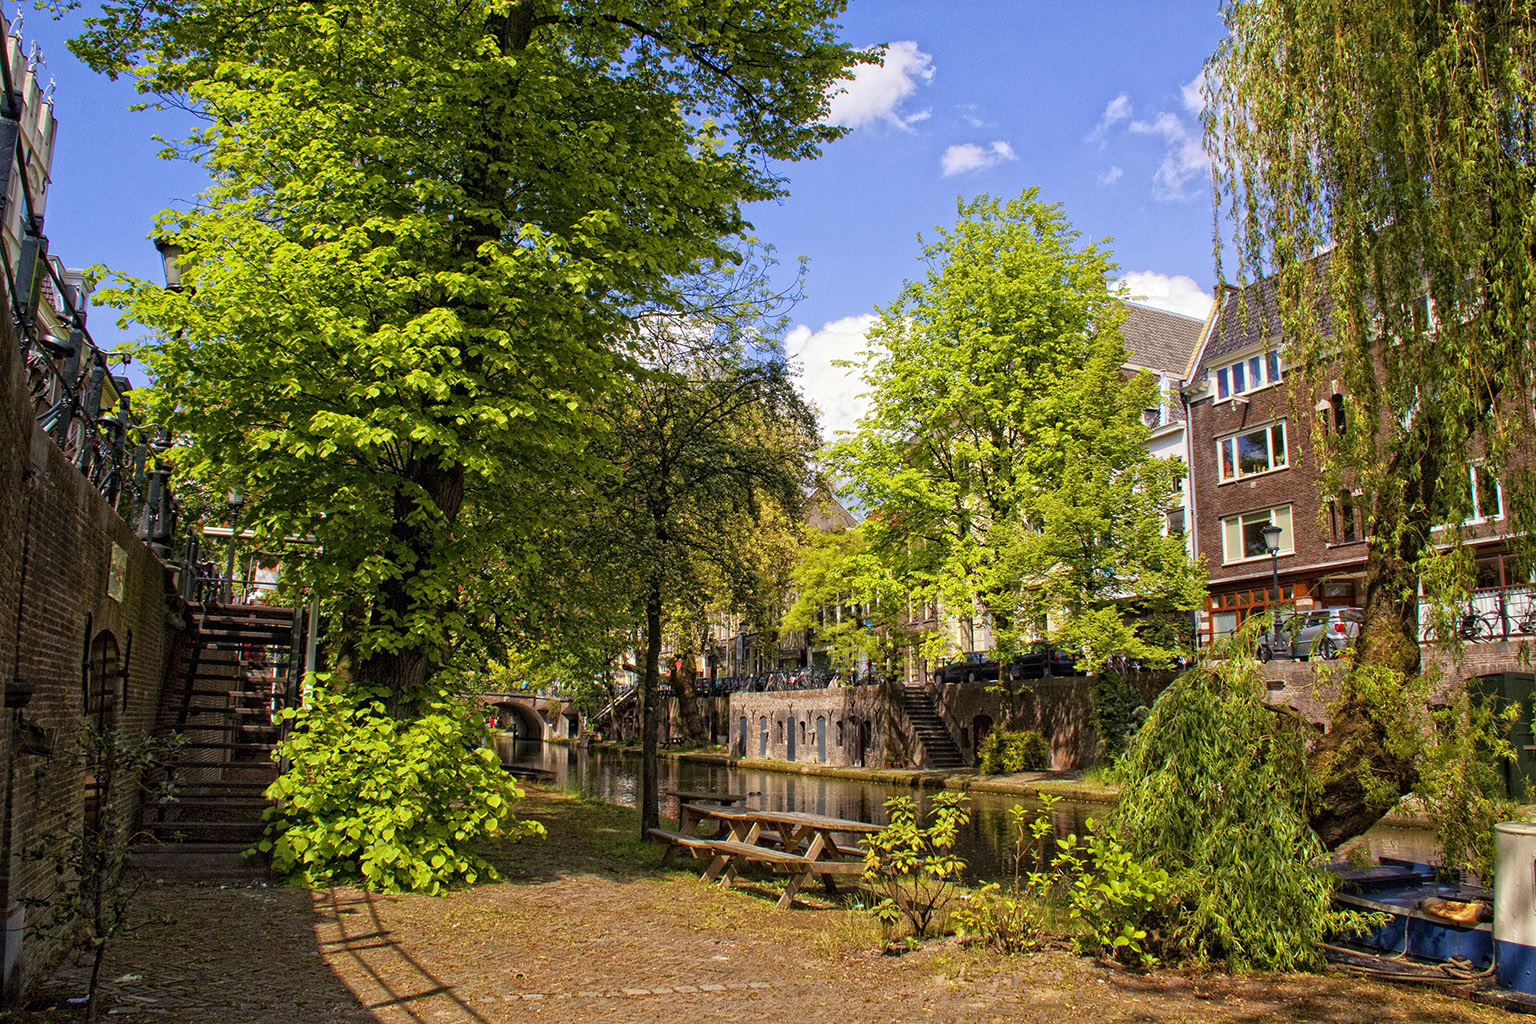 Utrecht Spring 2010 13